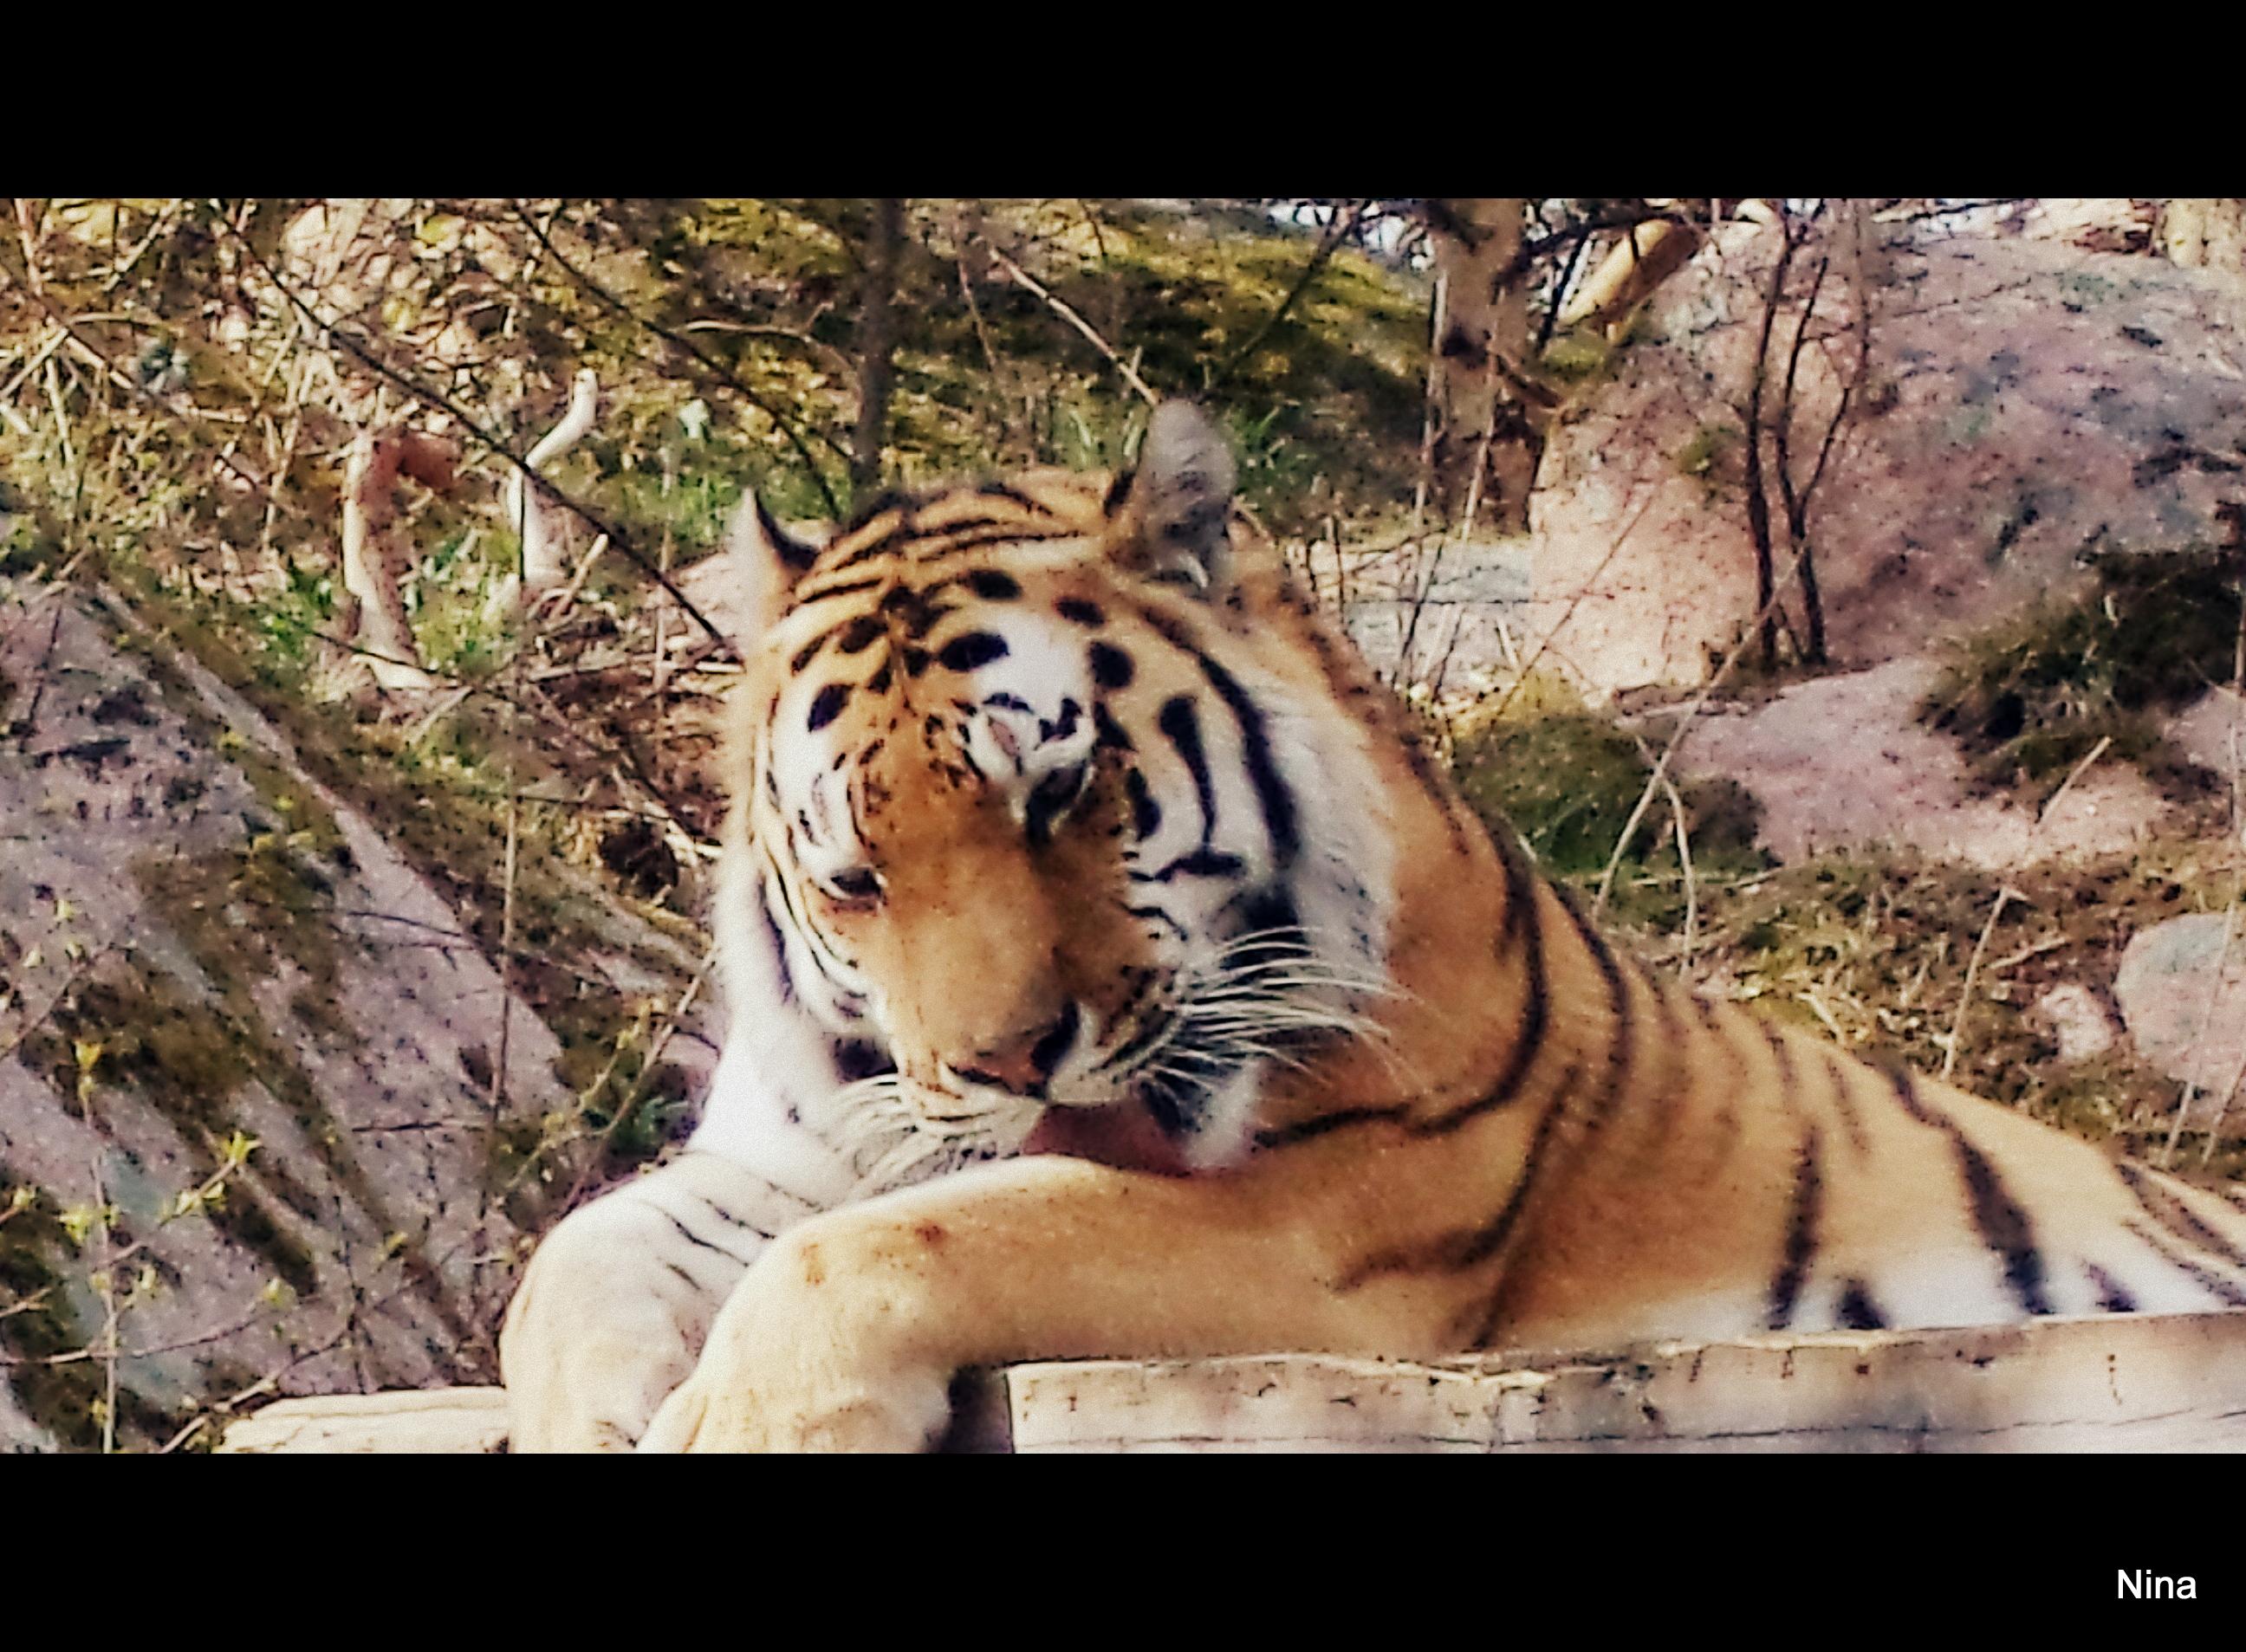 Betraktar tigern